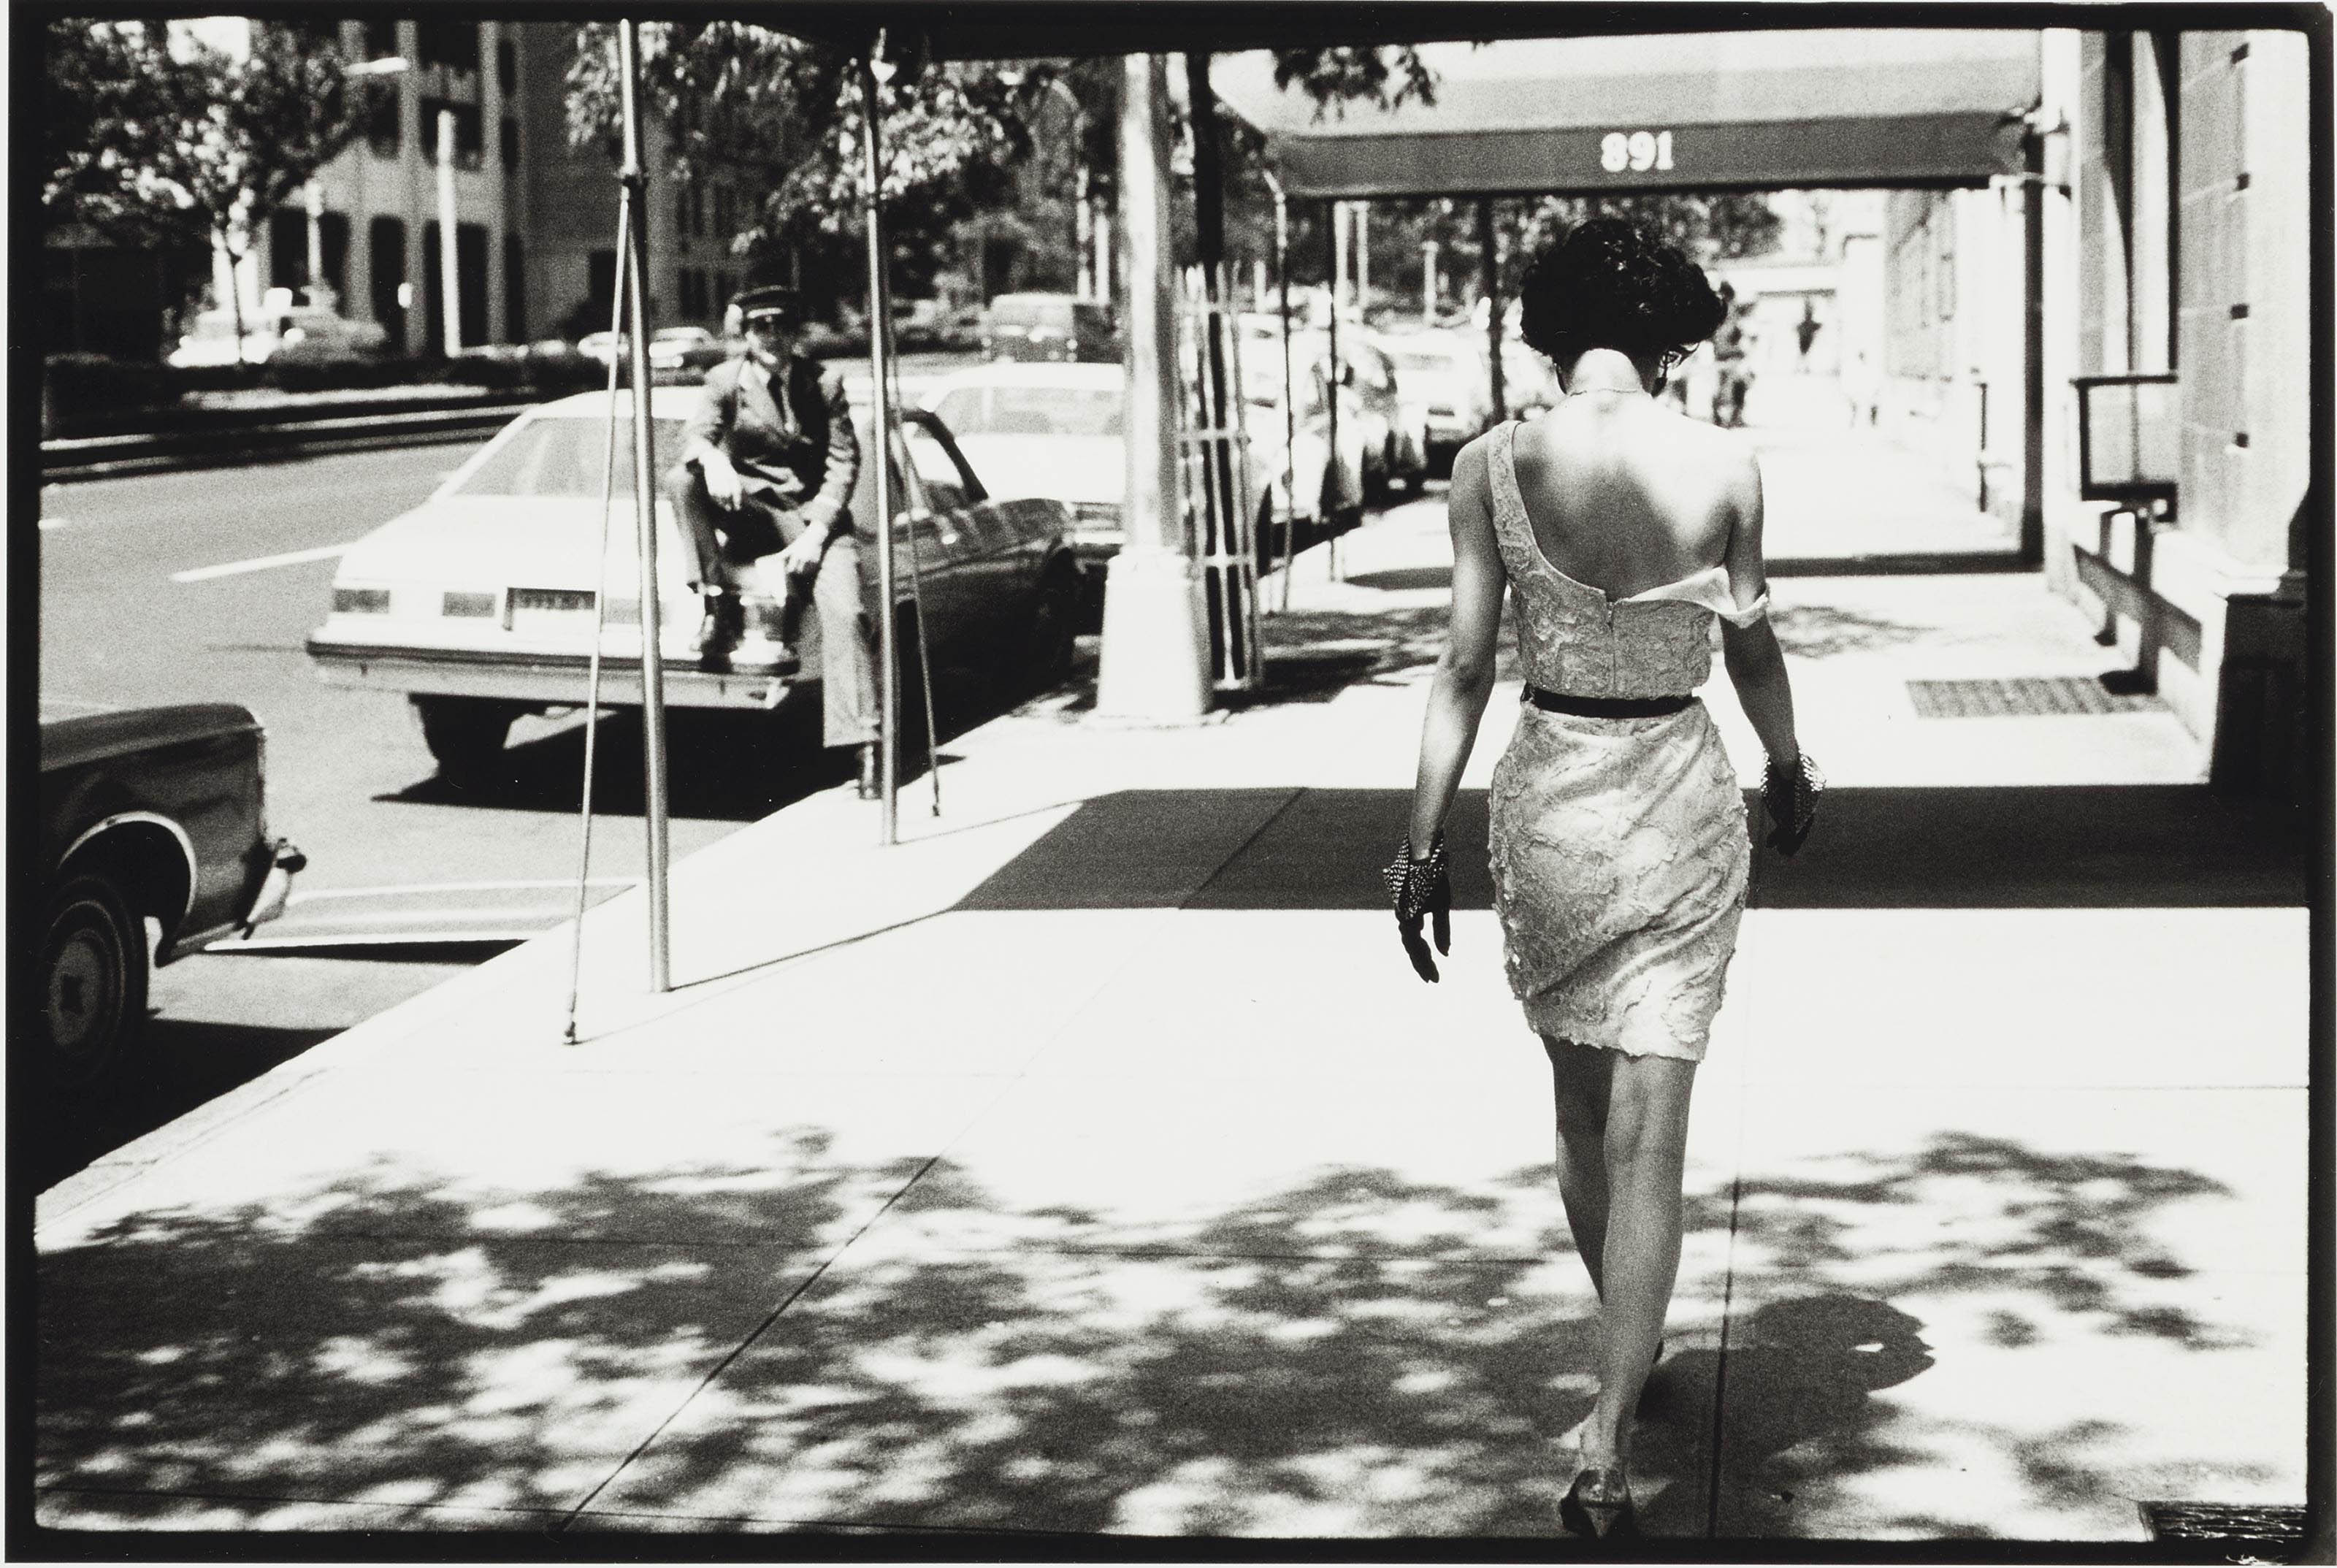 Wendy Whitelaw on Park Avenue, New York, 1981